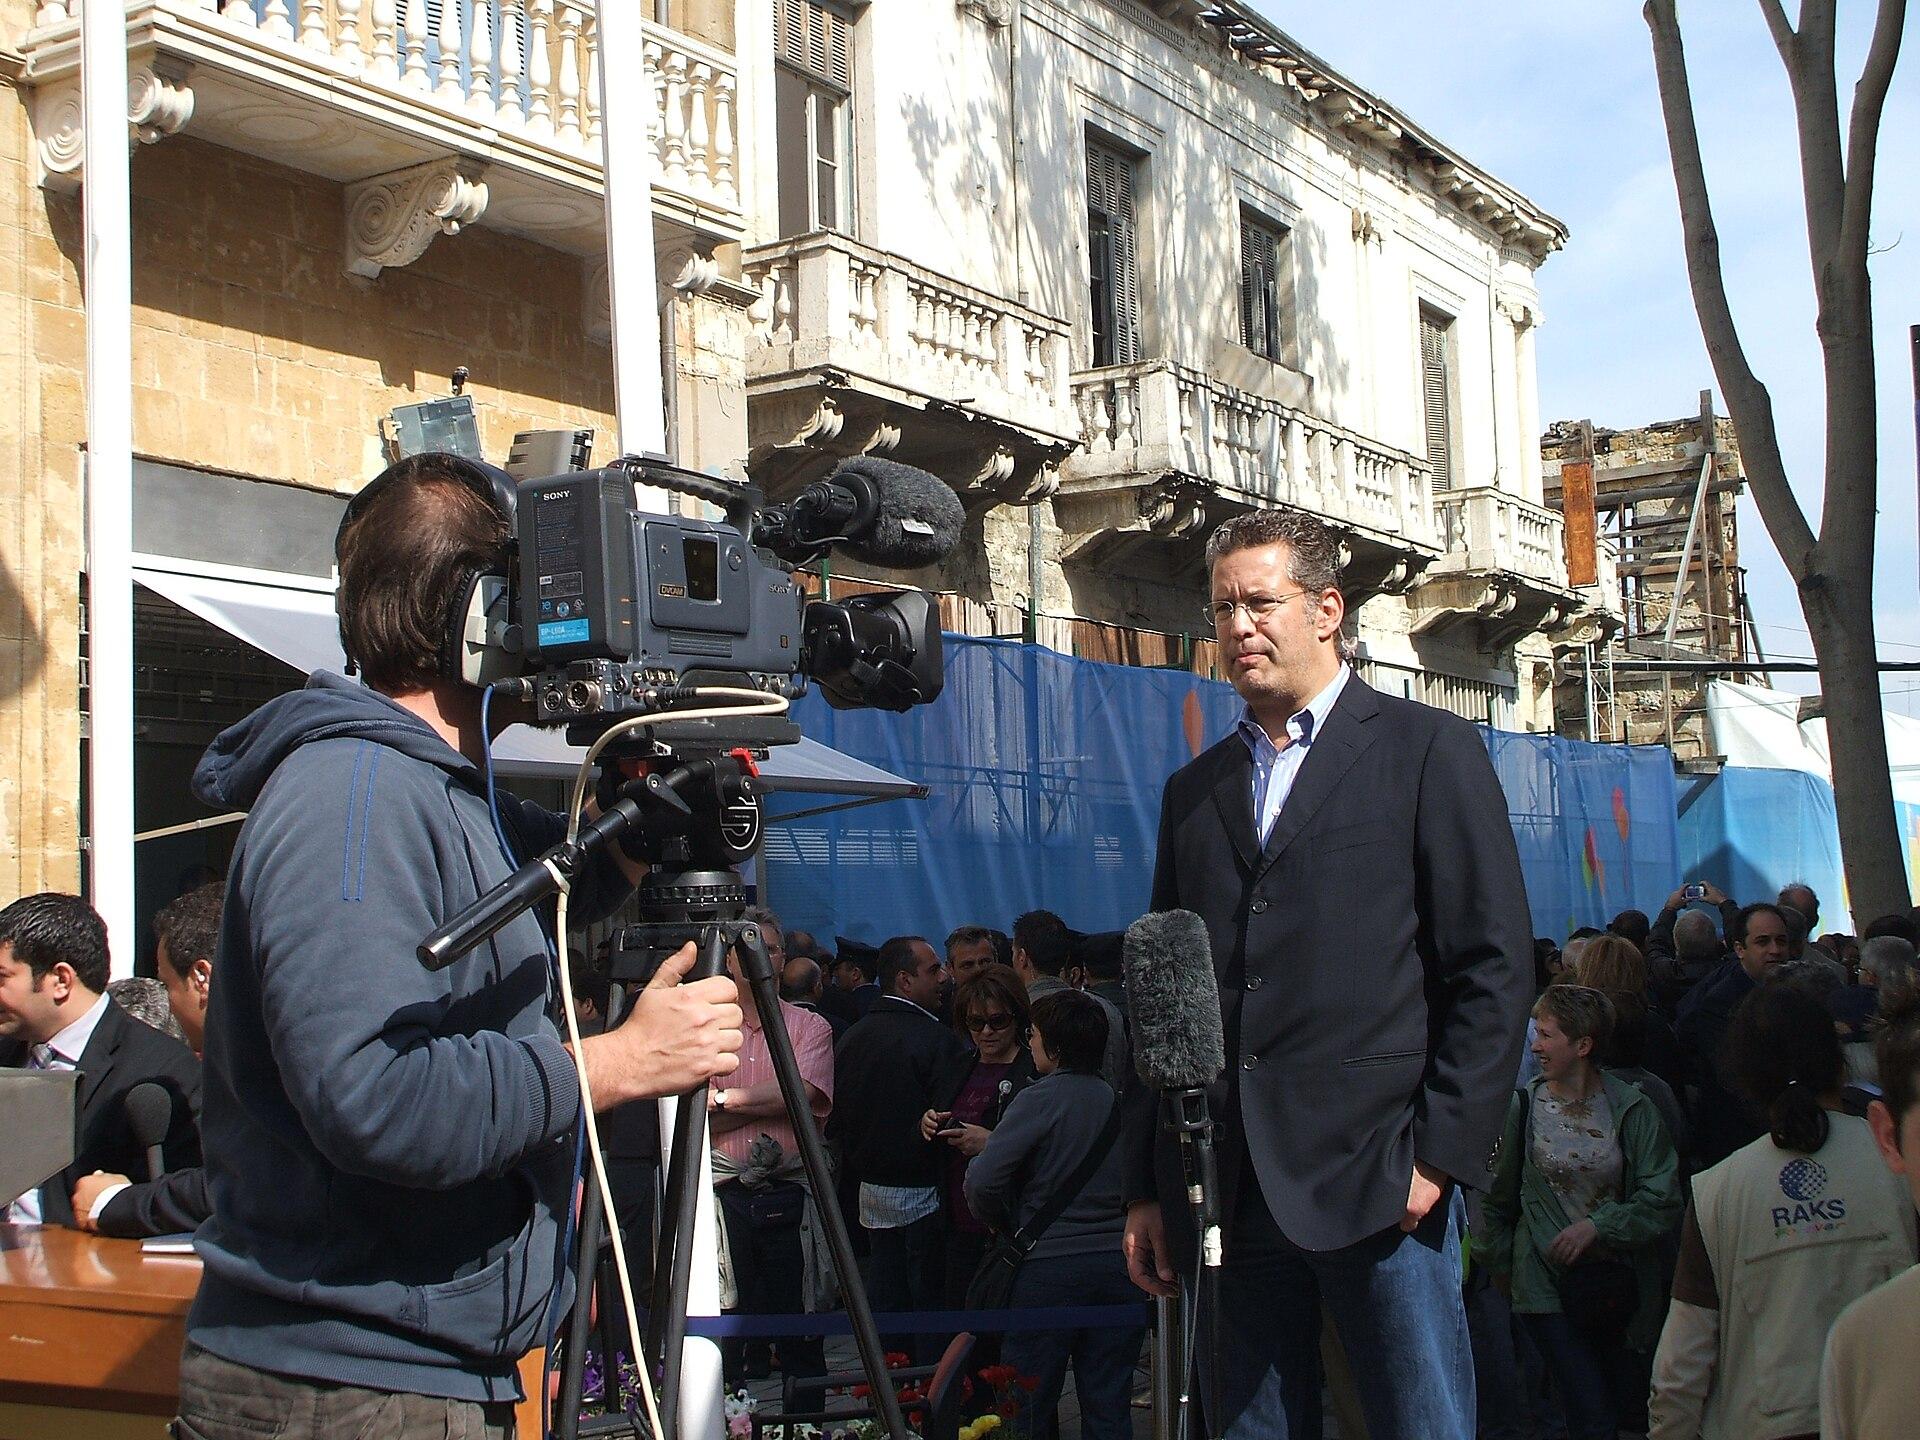 Journalist Stock Photos  Royalty Free Images  amp  Vectors   Shutterstock